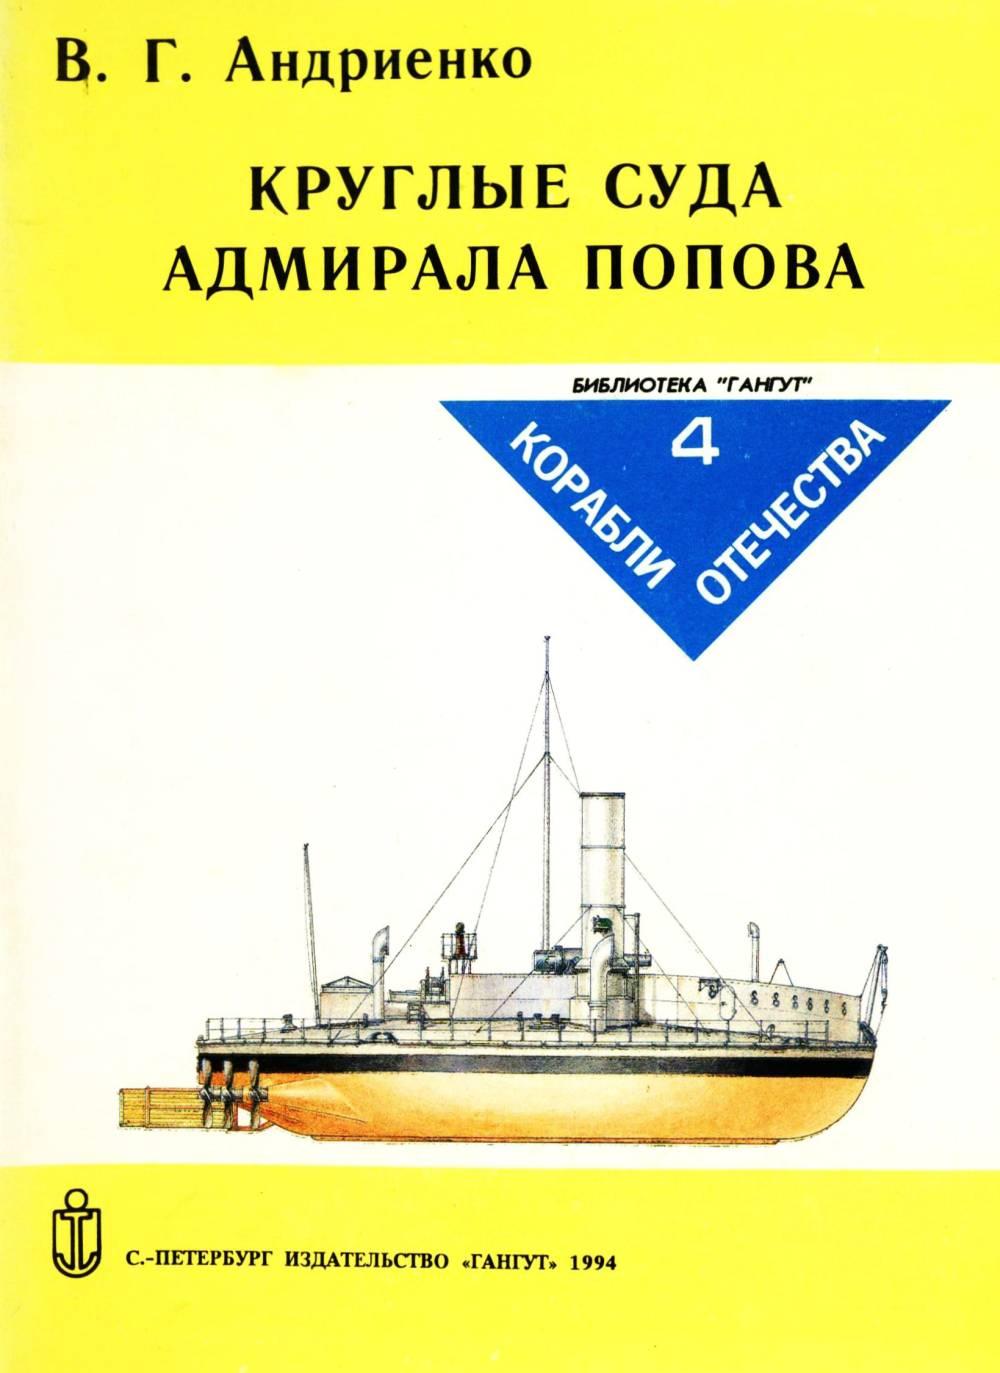 Круглые суда адмирала попова